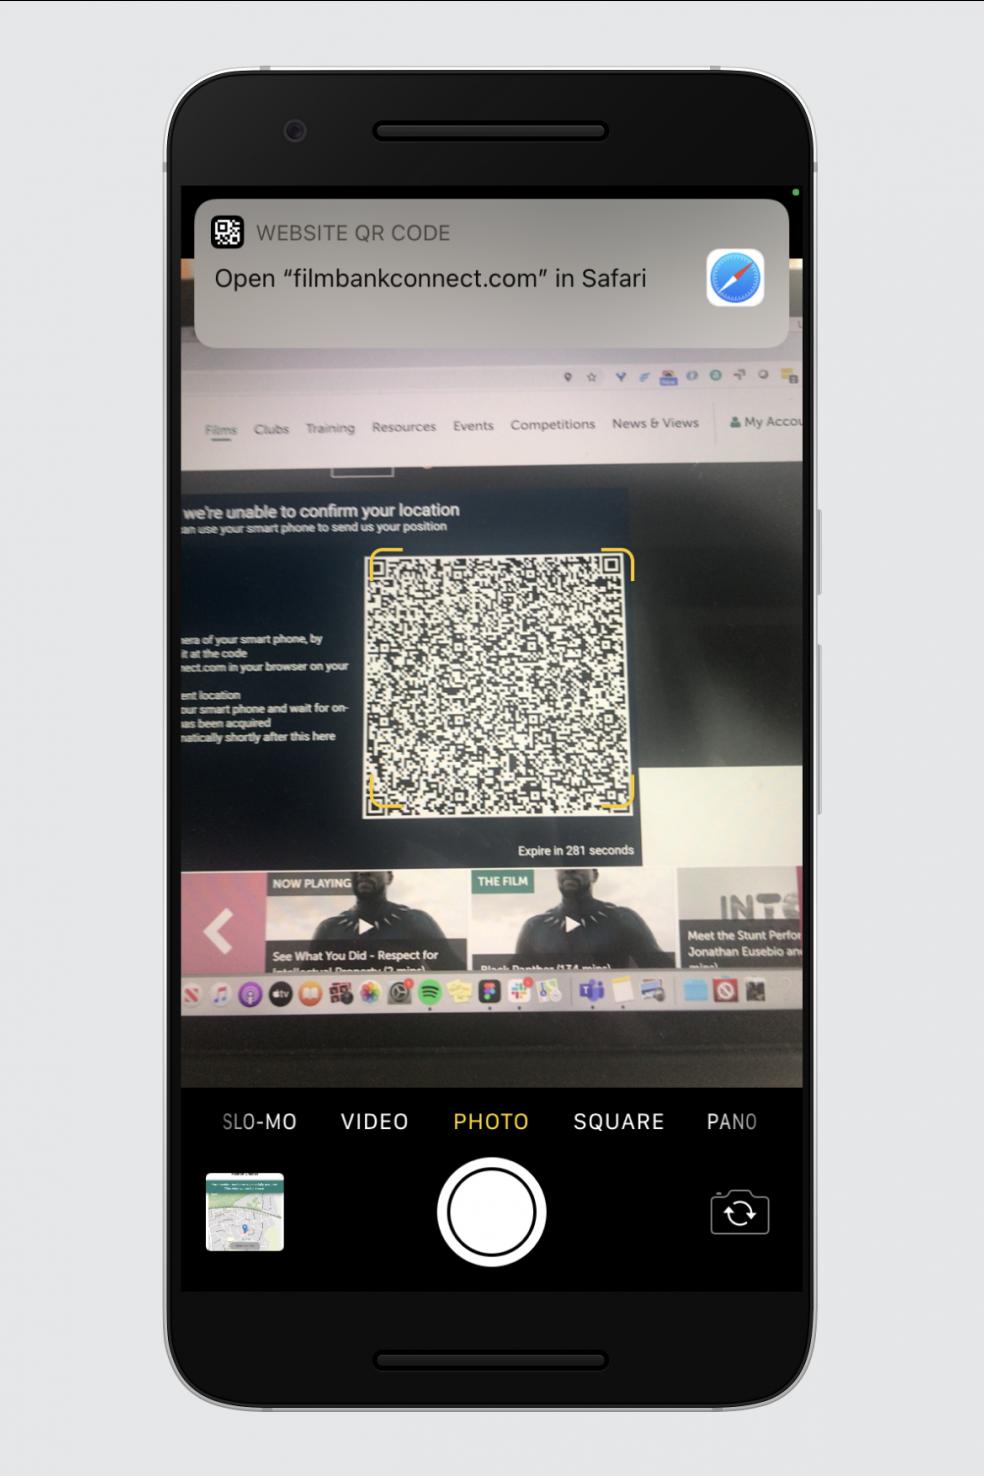 A phone camera pointed at a QR code